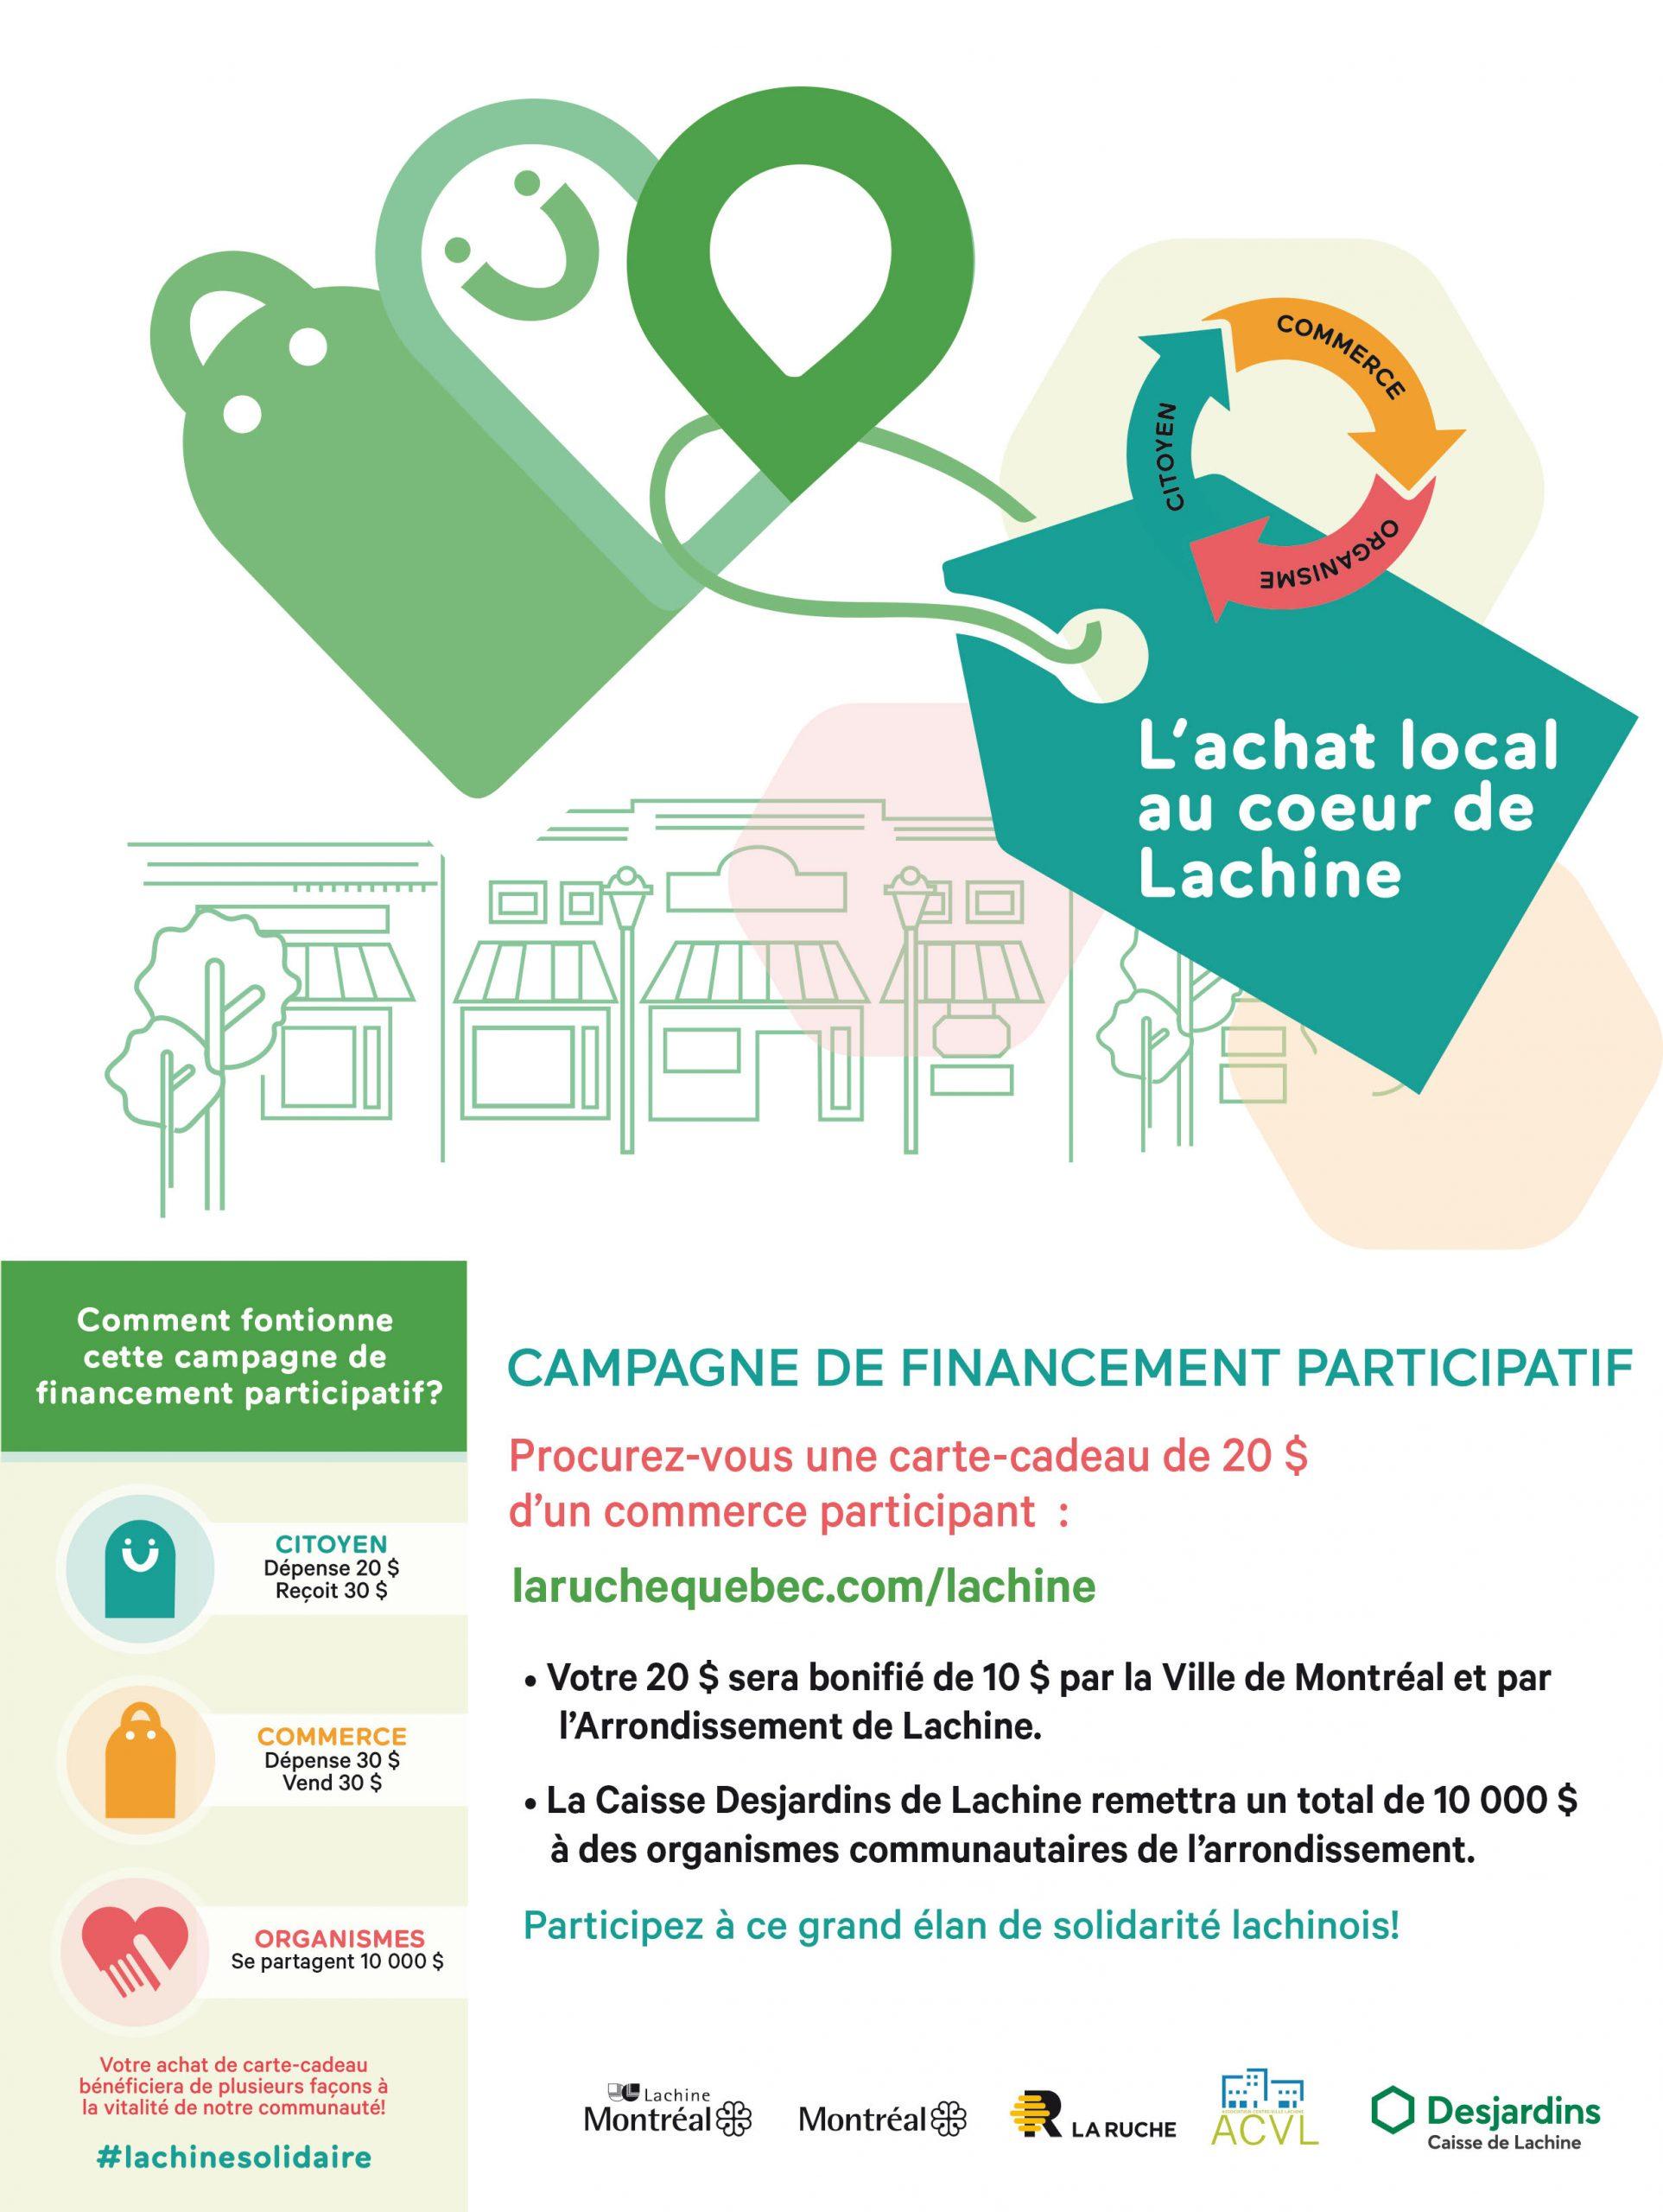 Campagne financement participative rue Notre-Dame Lachine